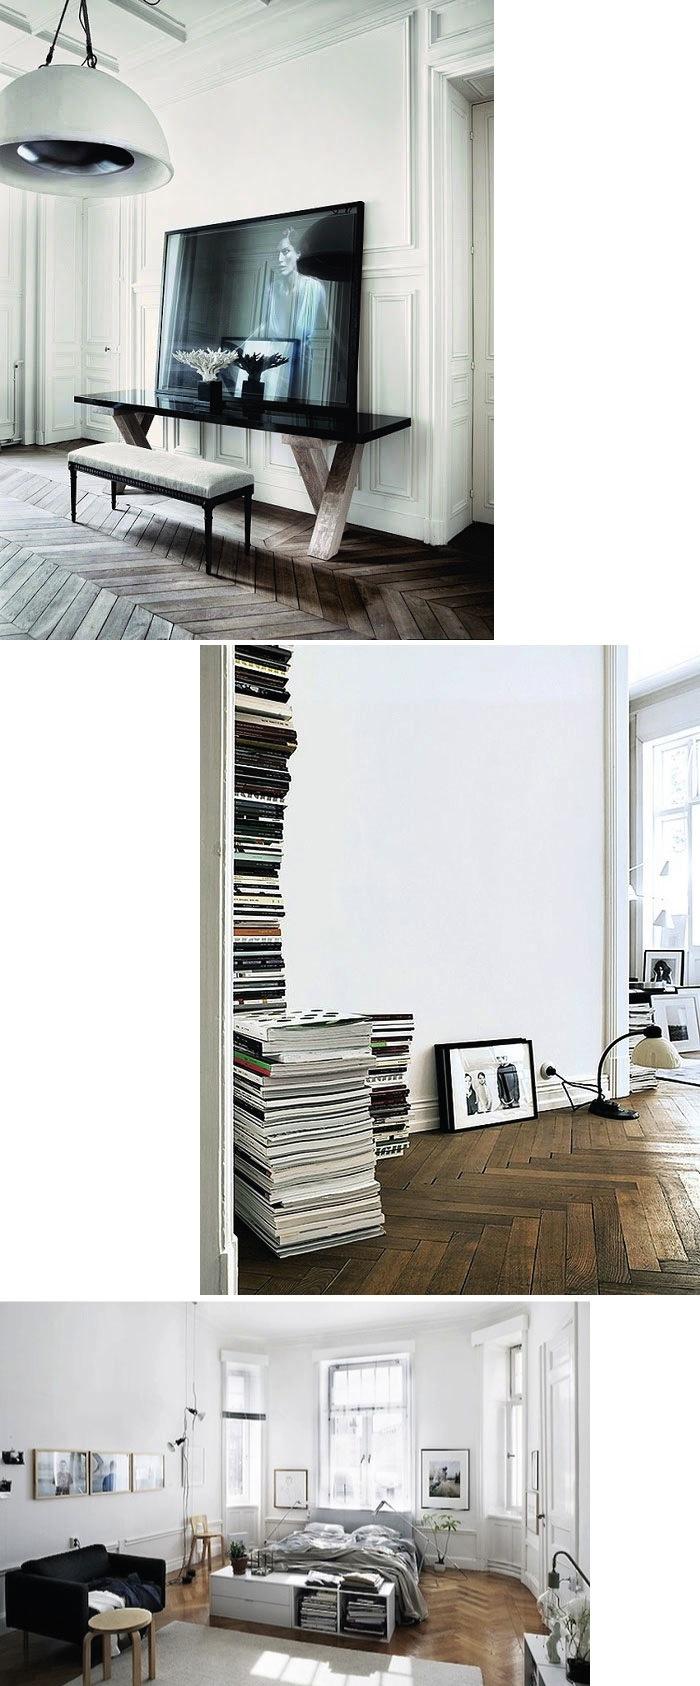 Interior_inspiration_173_velvetsnow.dk